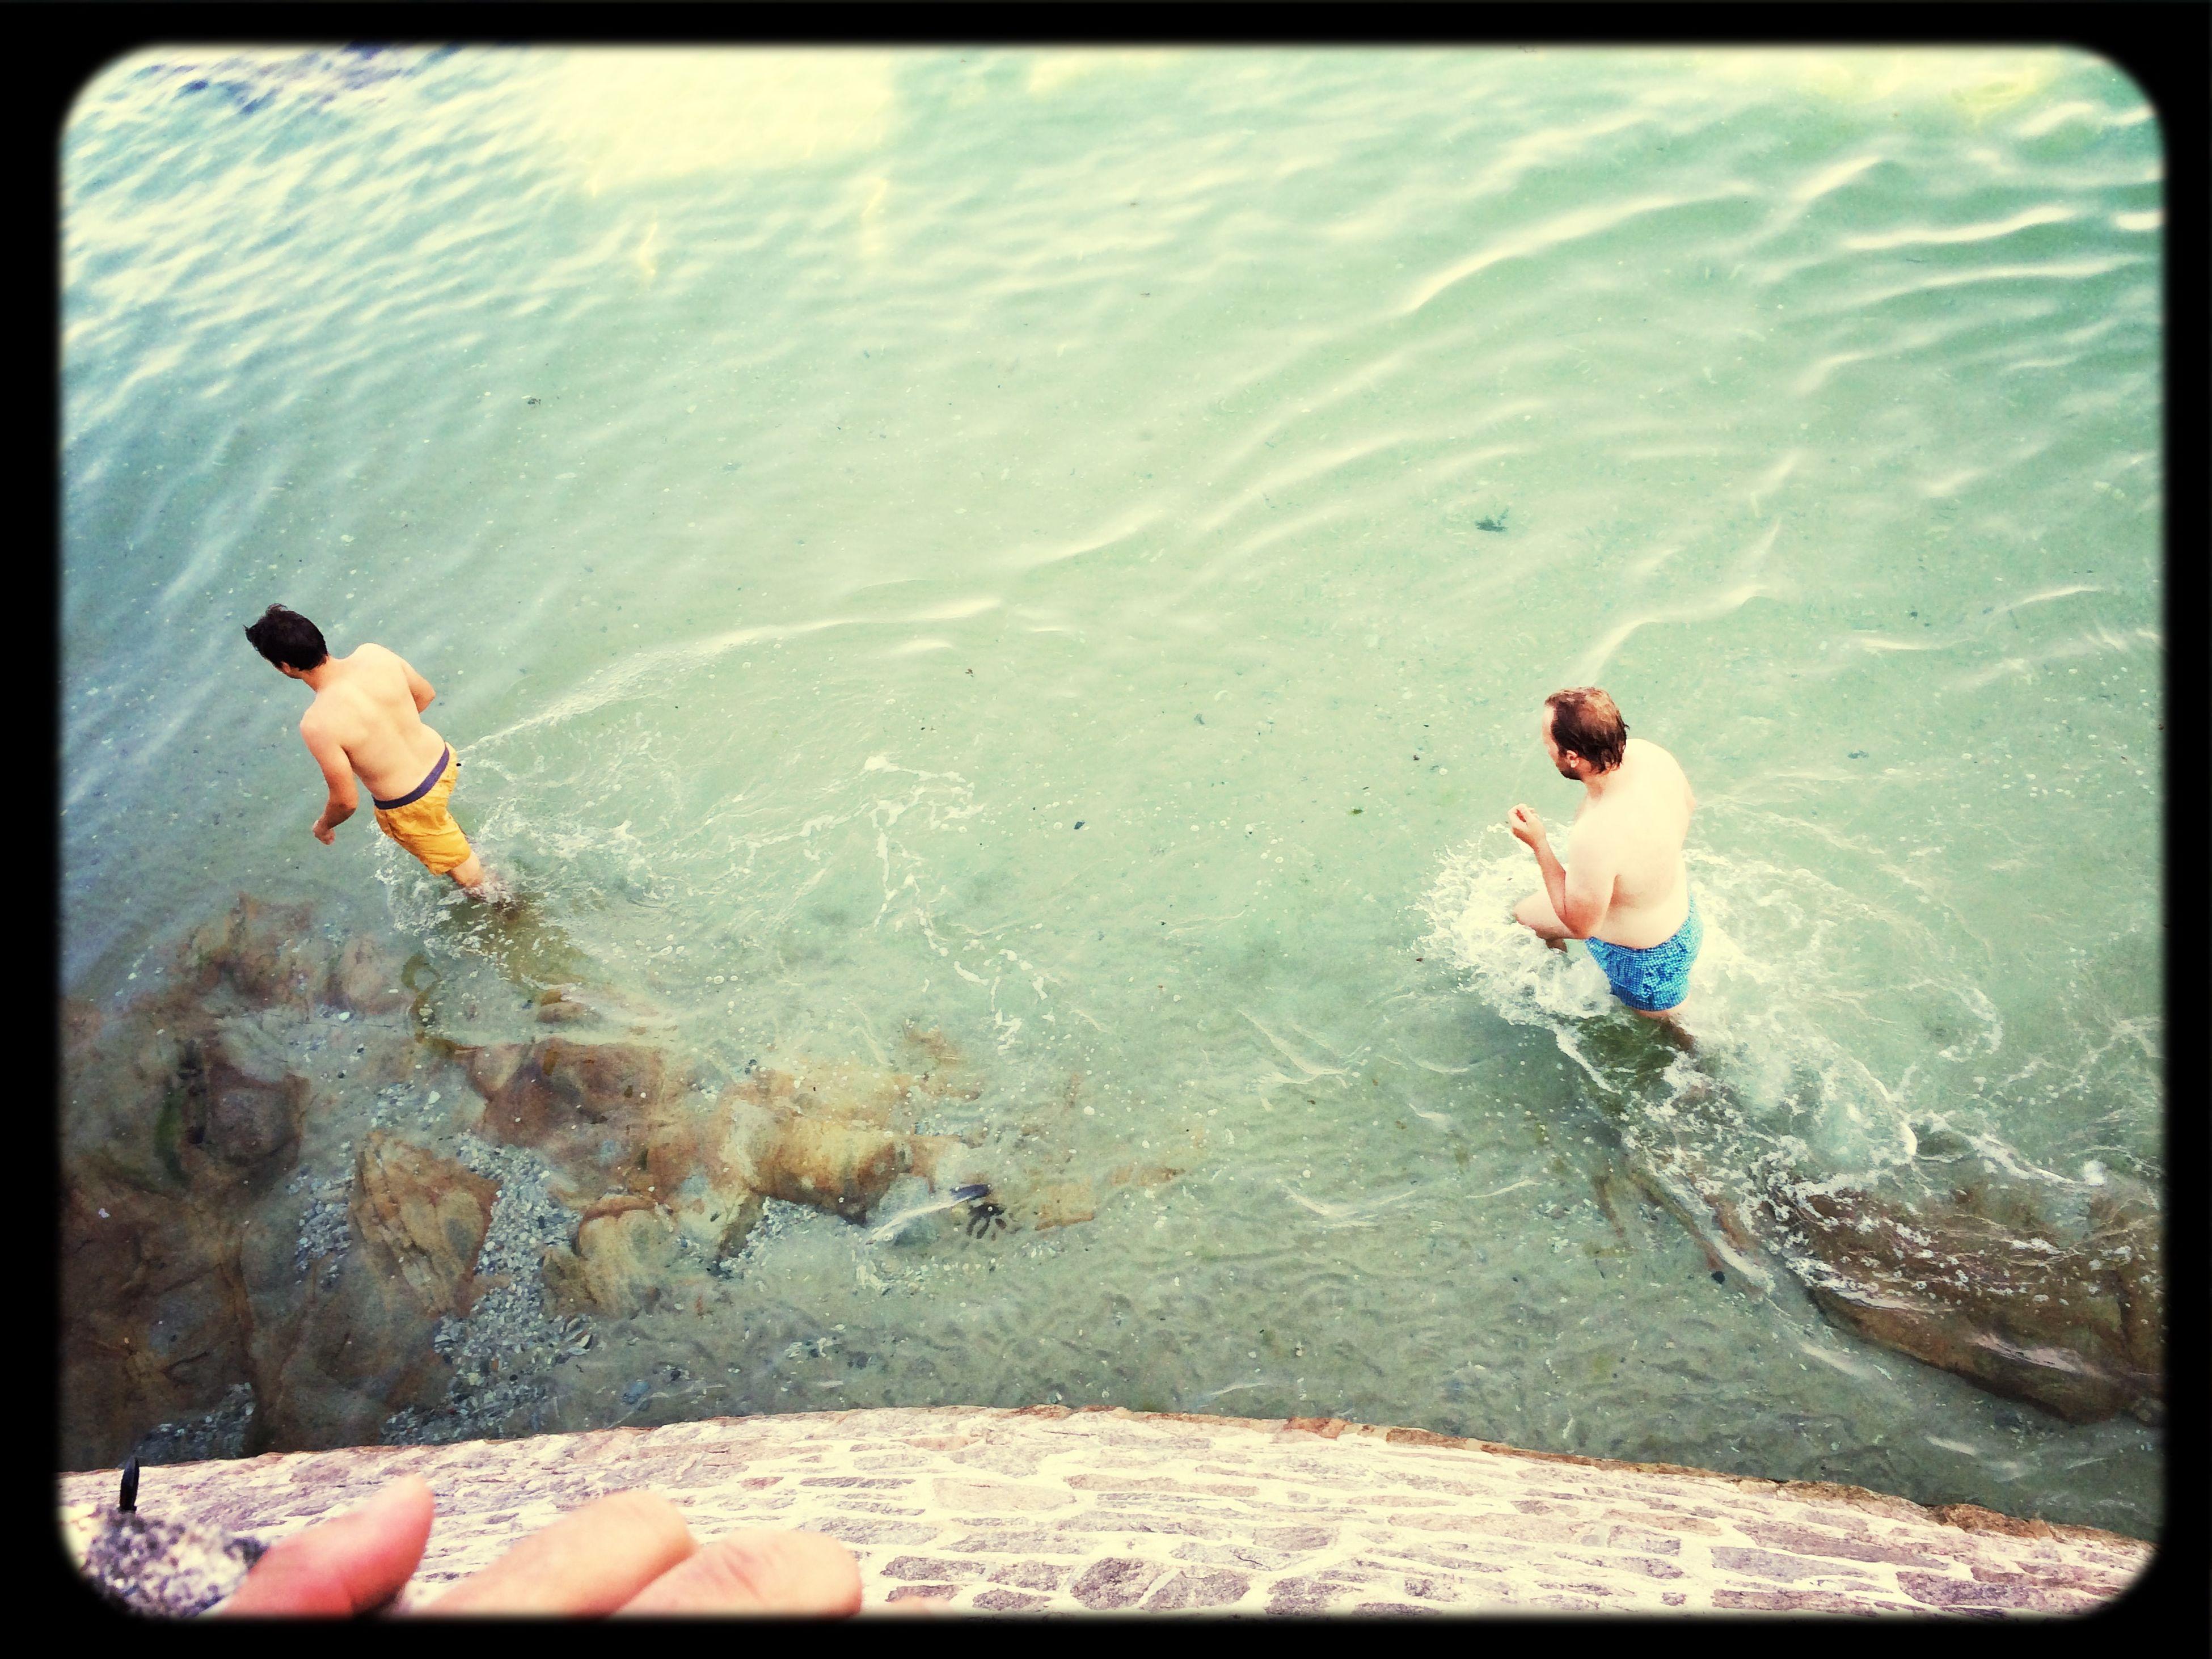 water, lifestyles, leisure activity, transfer print, auto post production filter, sea, full length, enjoyment, barefoot, fun, vacations, men, person, jumping, swimming pool, bikini, shirtless